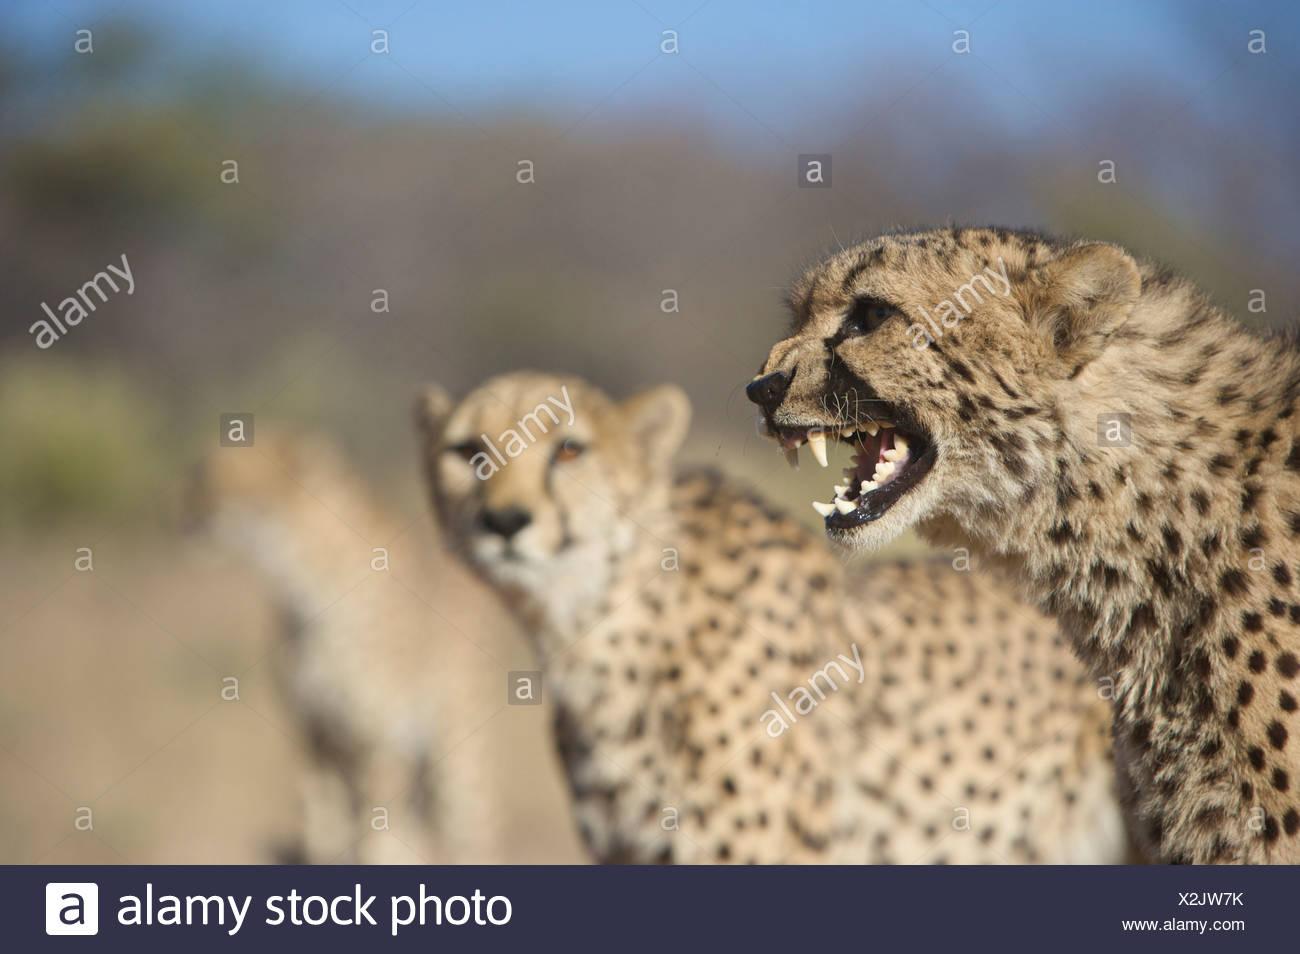 Gepard (Acinonyx Jubatus) knurrend mit anderen im Hintergrund, Namibia Stockfoto